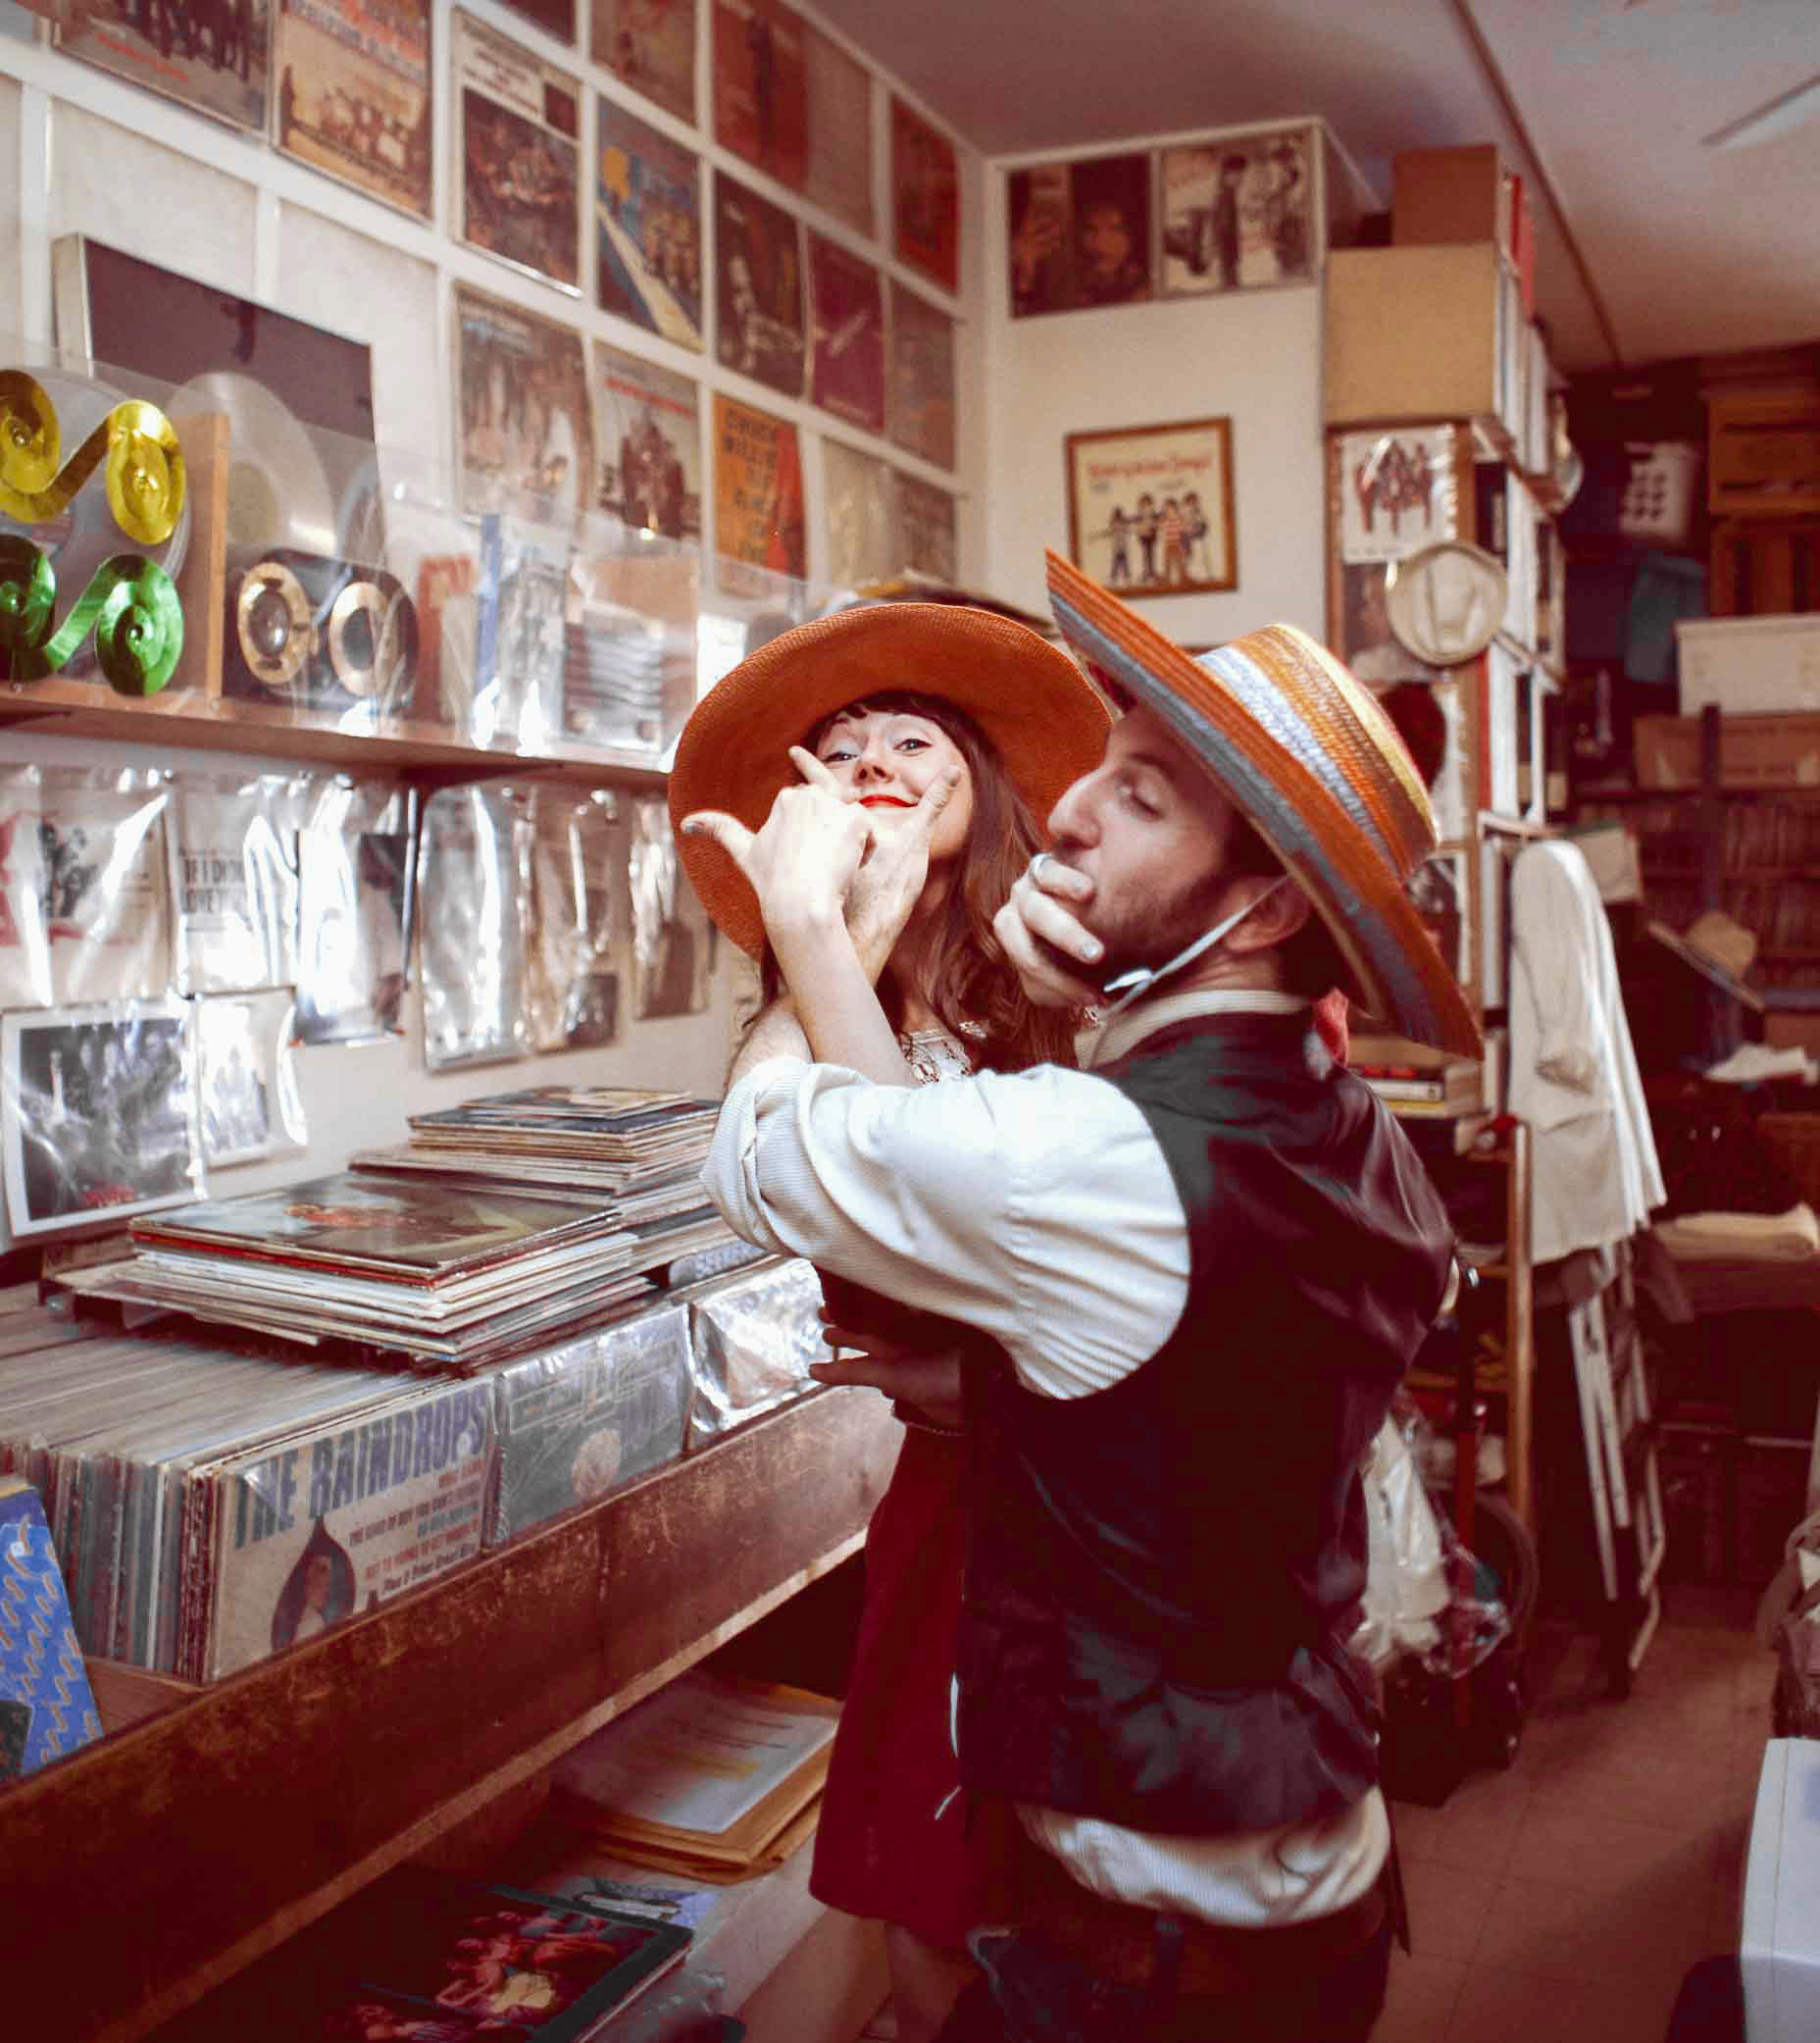 strider records west village record store day vinyl doo wop chellise michael photography rijard-104.jpg